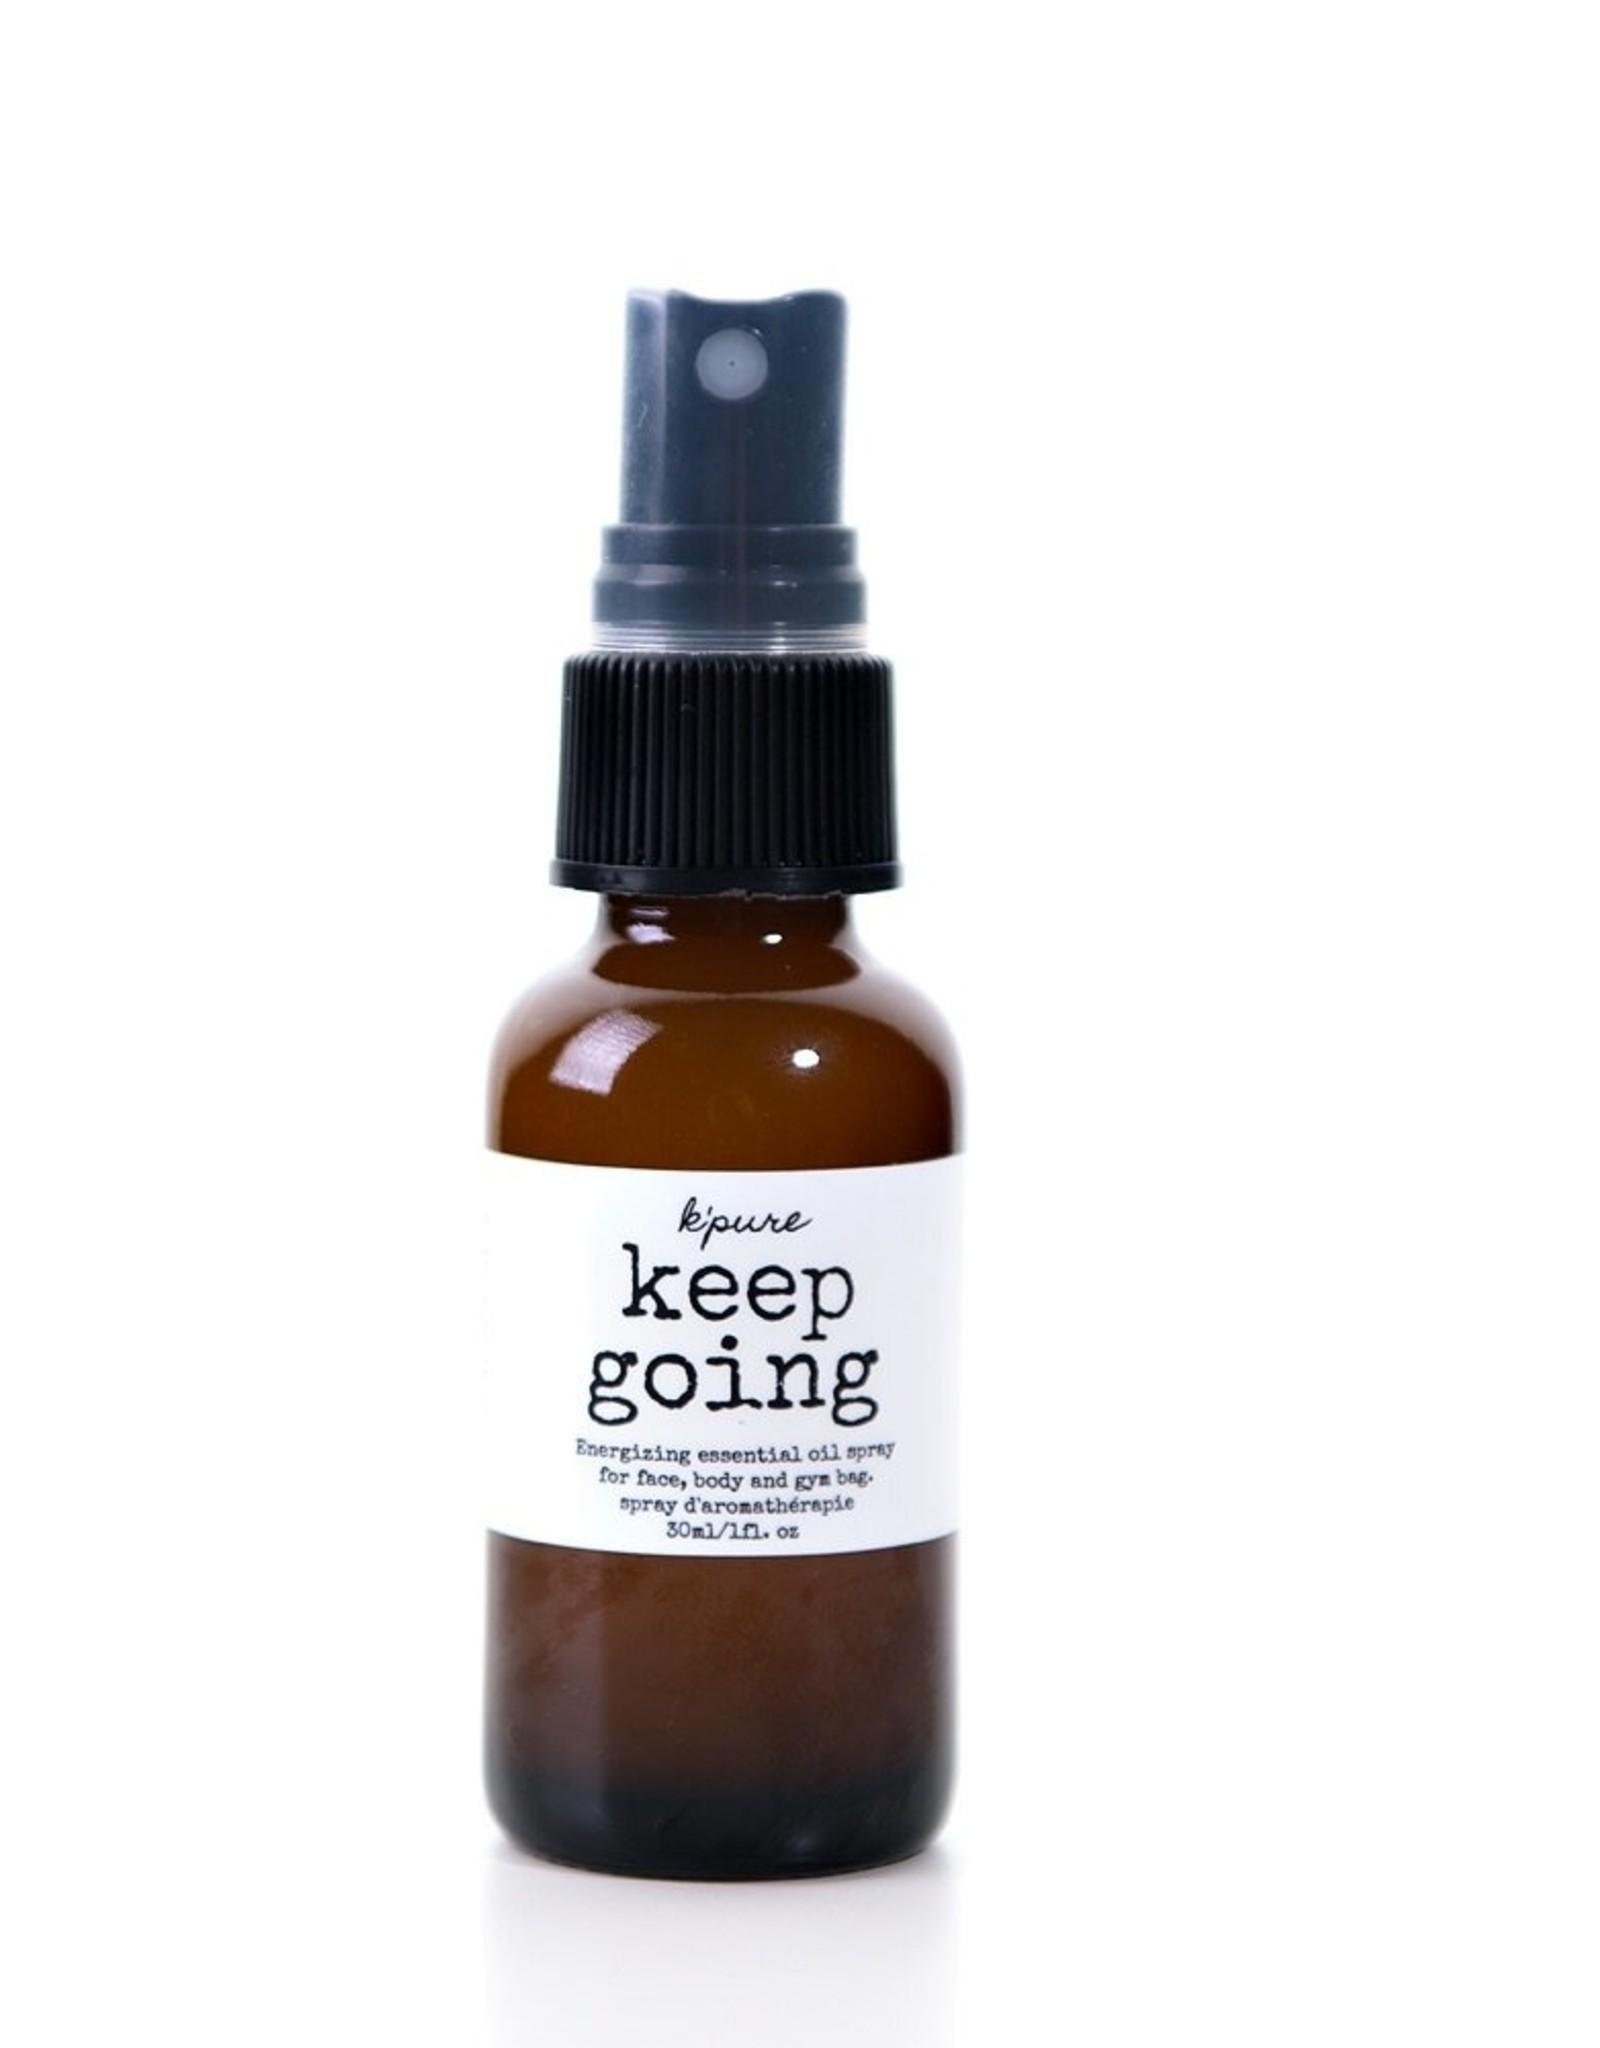 K'Pure Keep Going 30ml Spray